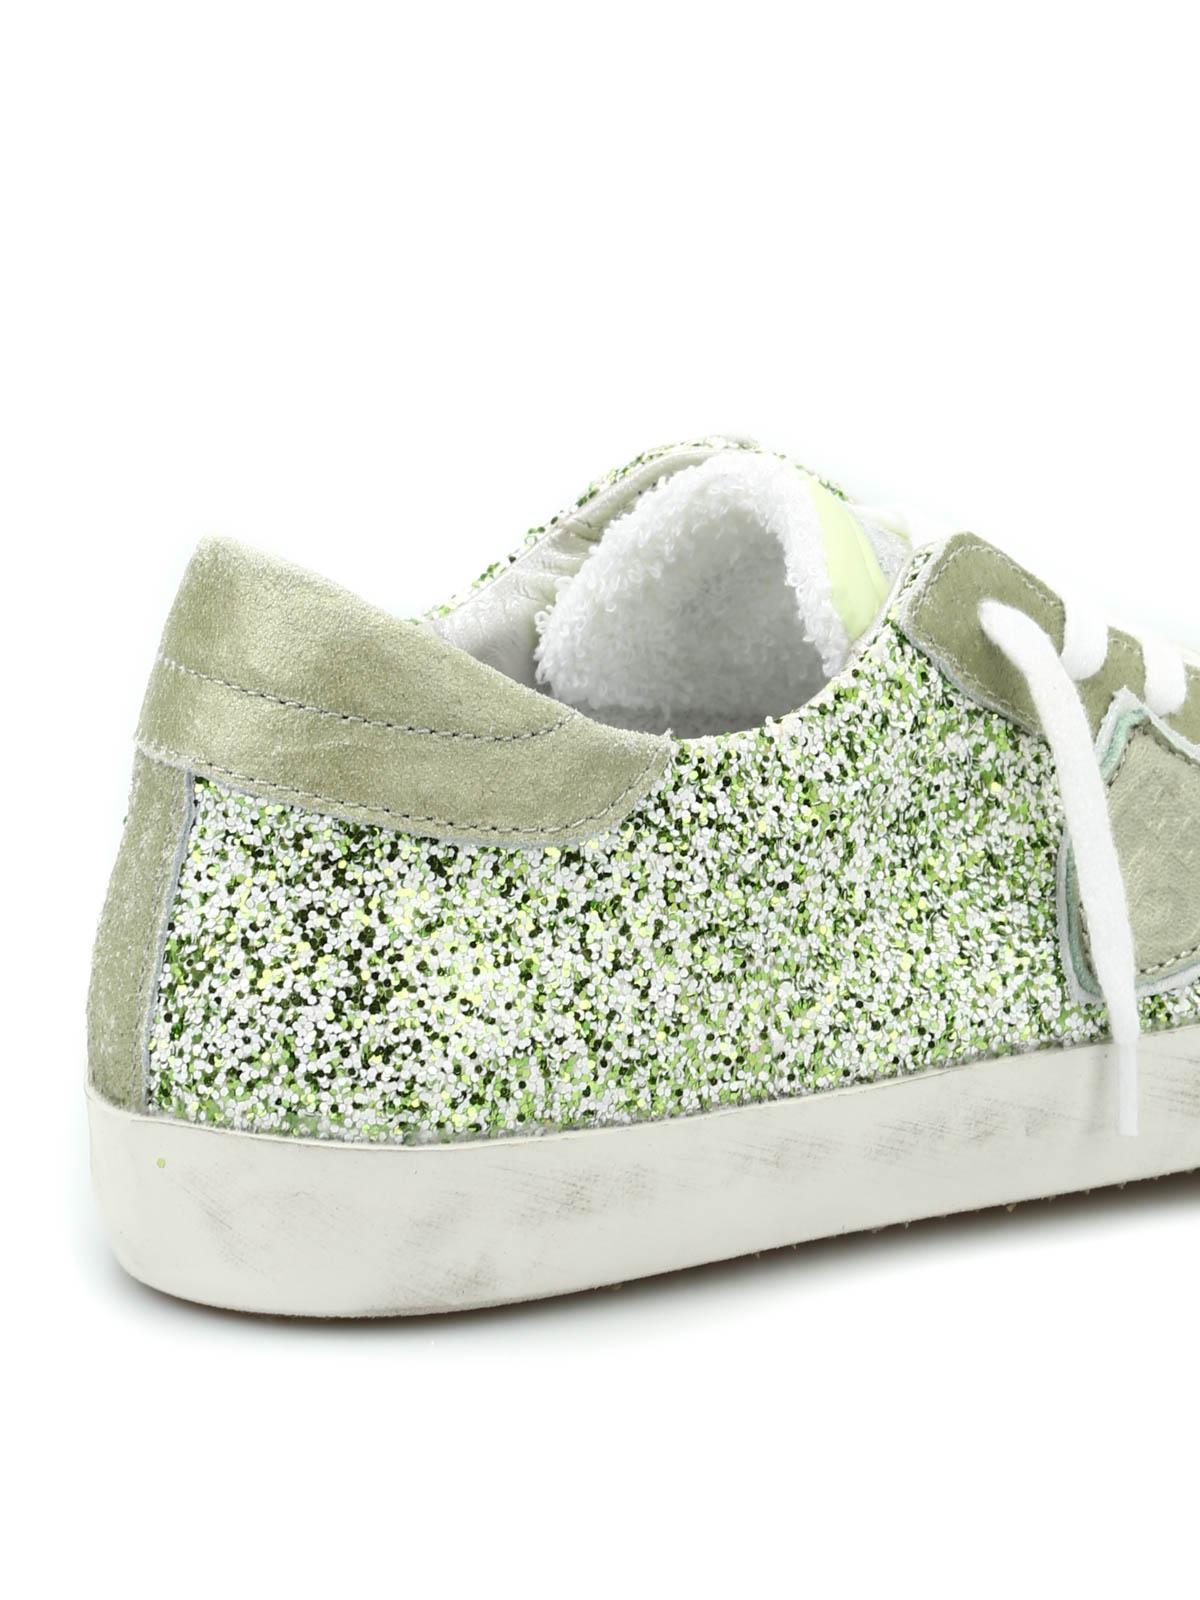 Philippe Sneakers Model Clld Basse Glitter Sneaker Gg13 In rT8Xrq